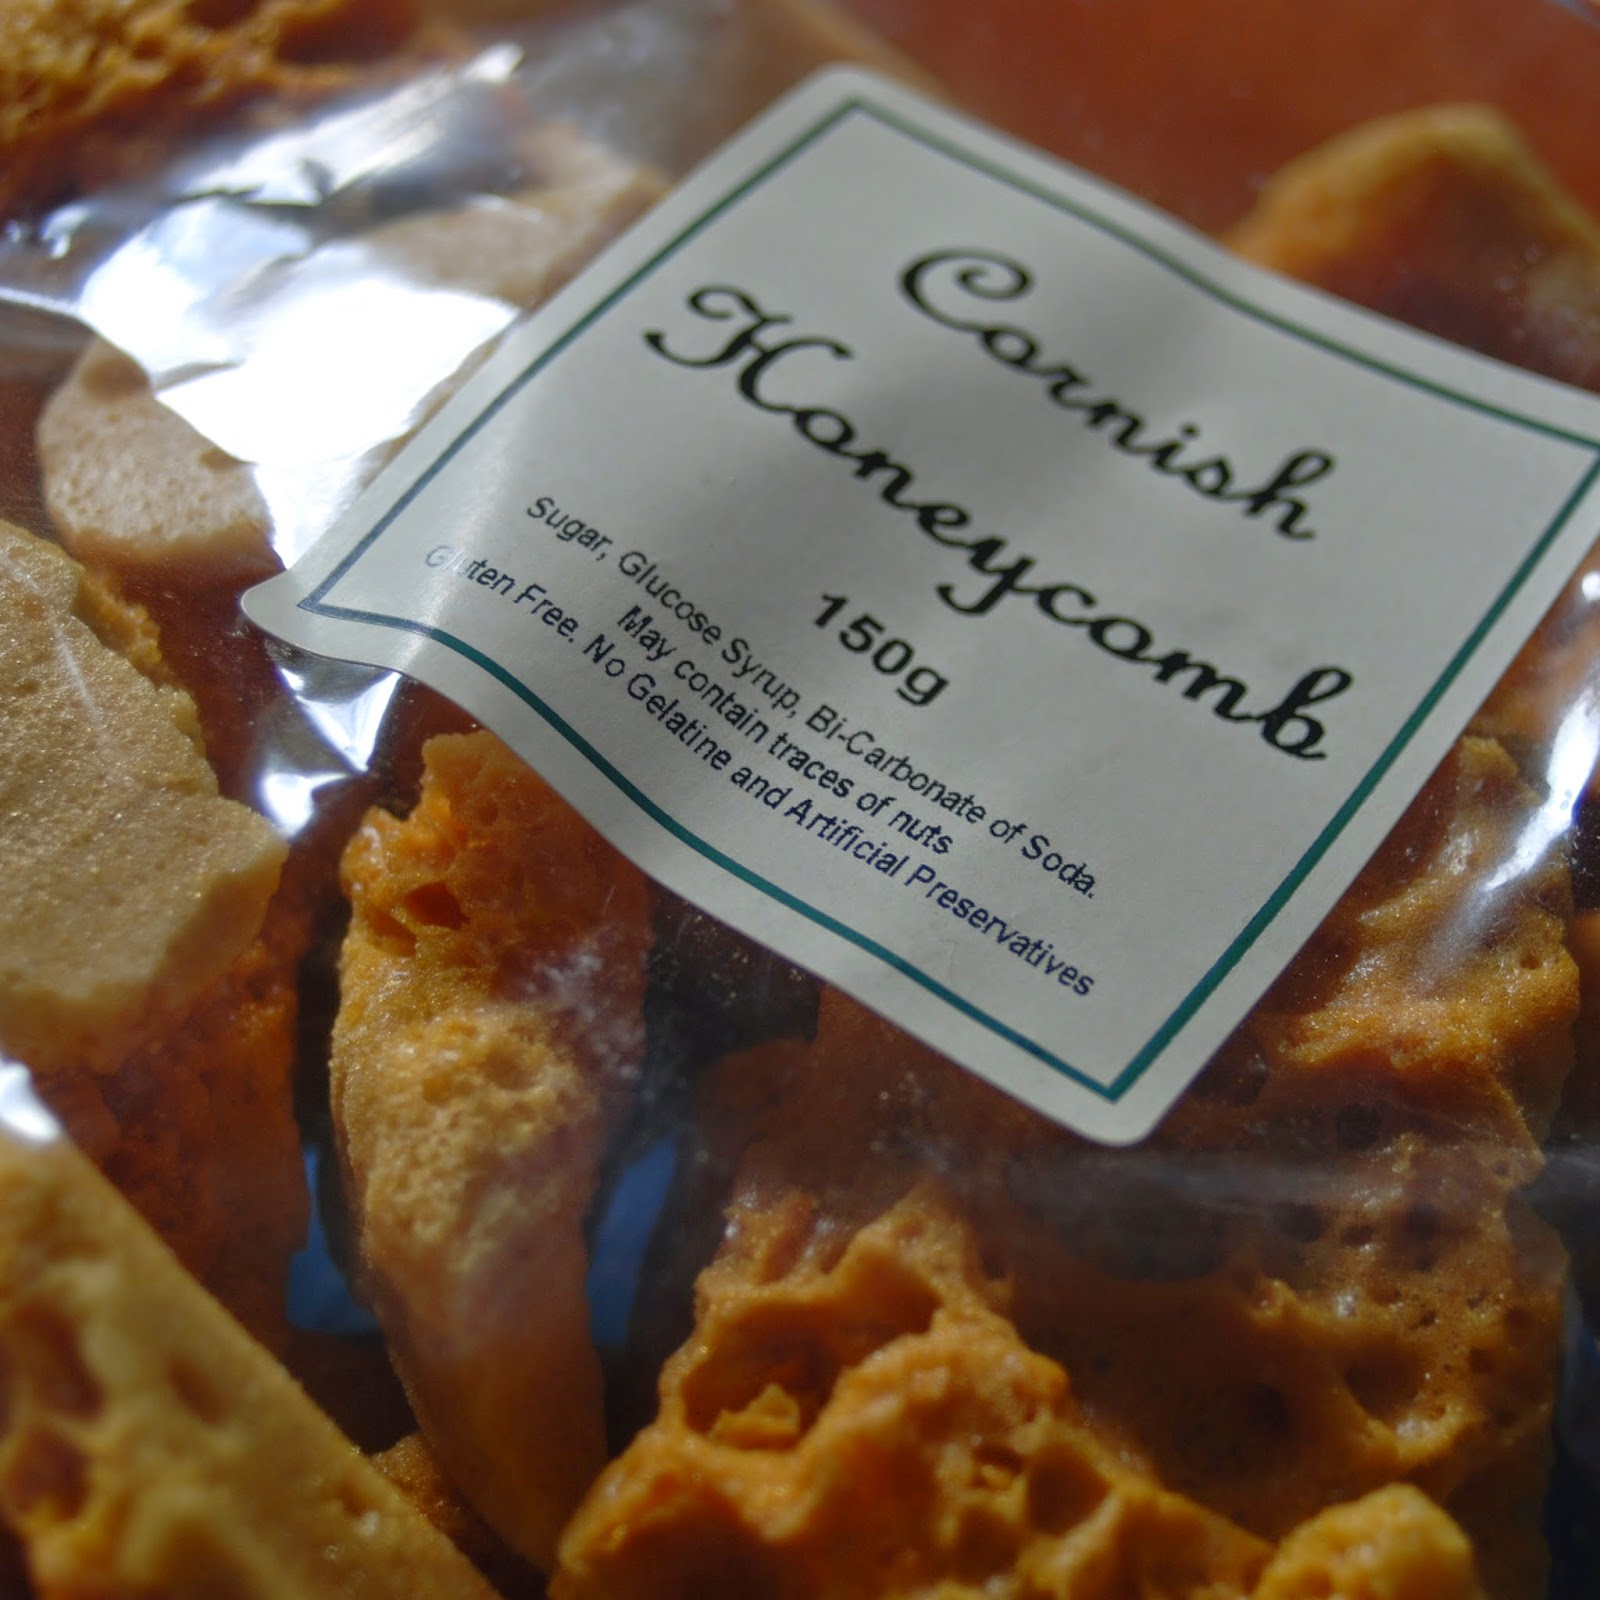 Cornish Honeycomb from 'Cornish Delights'